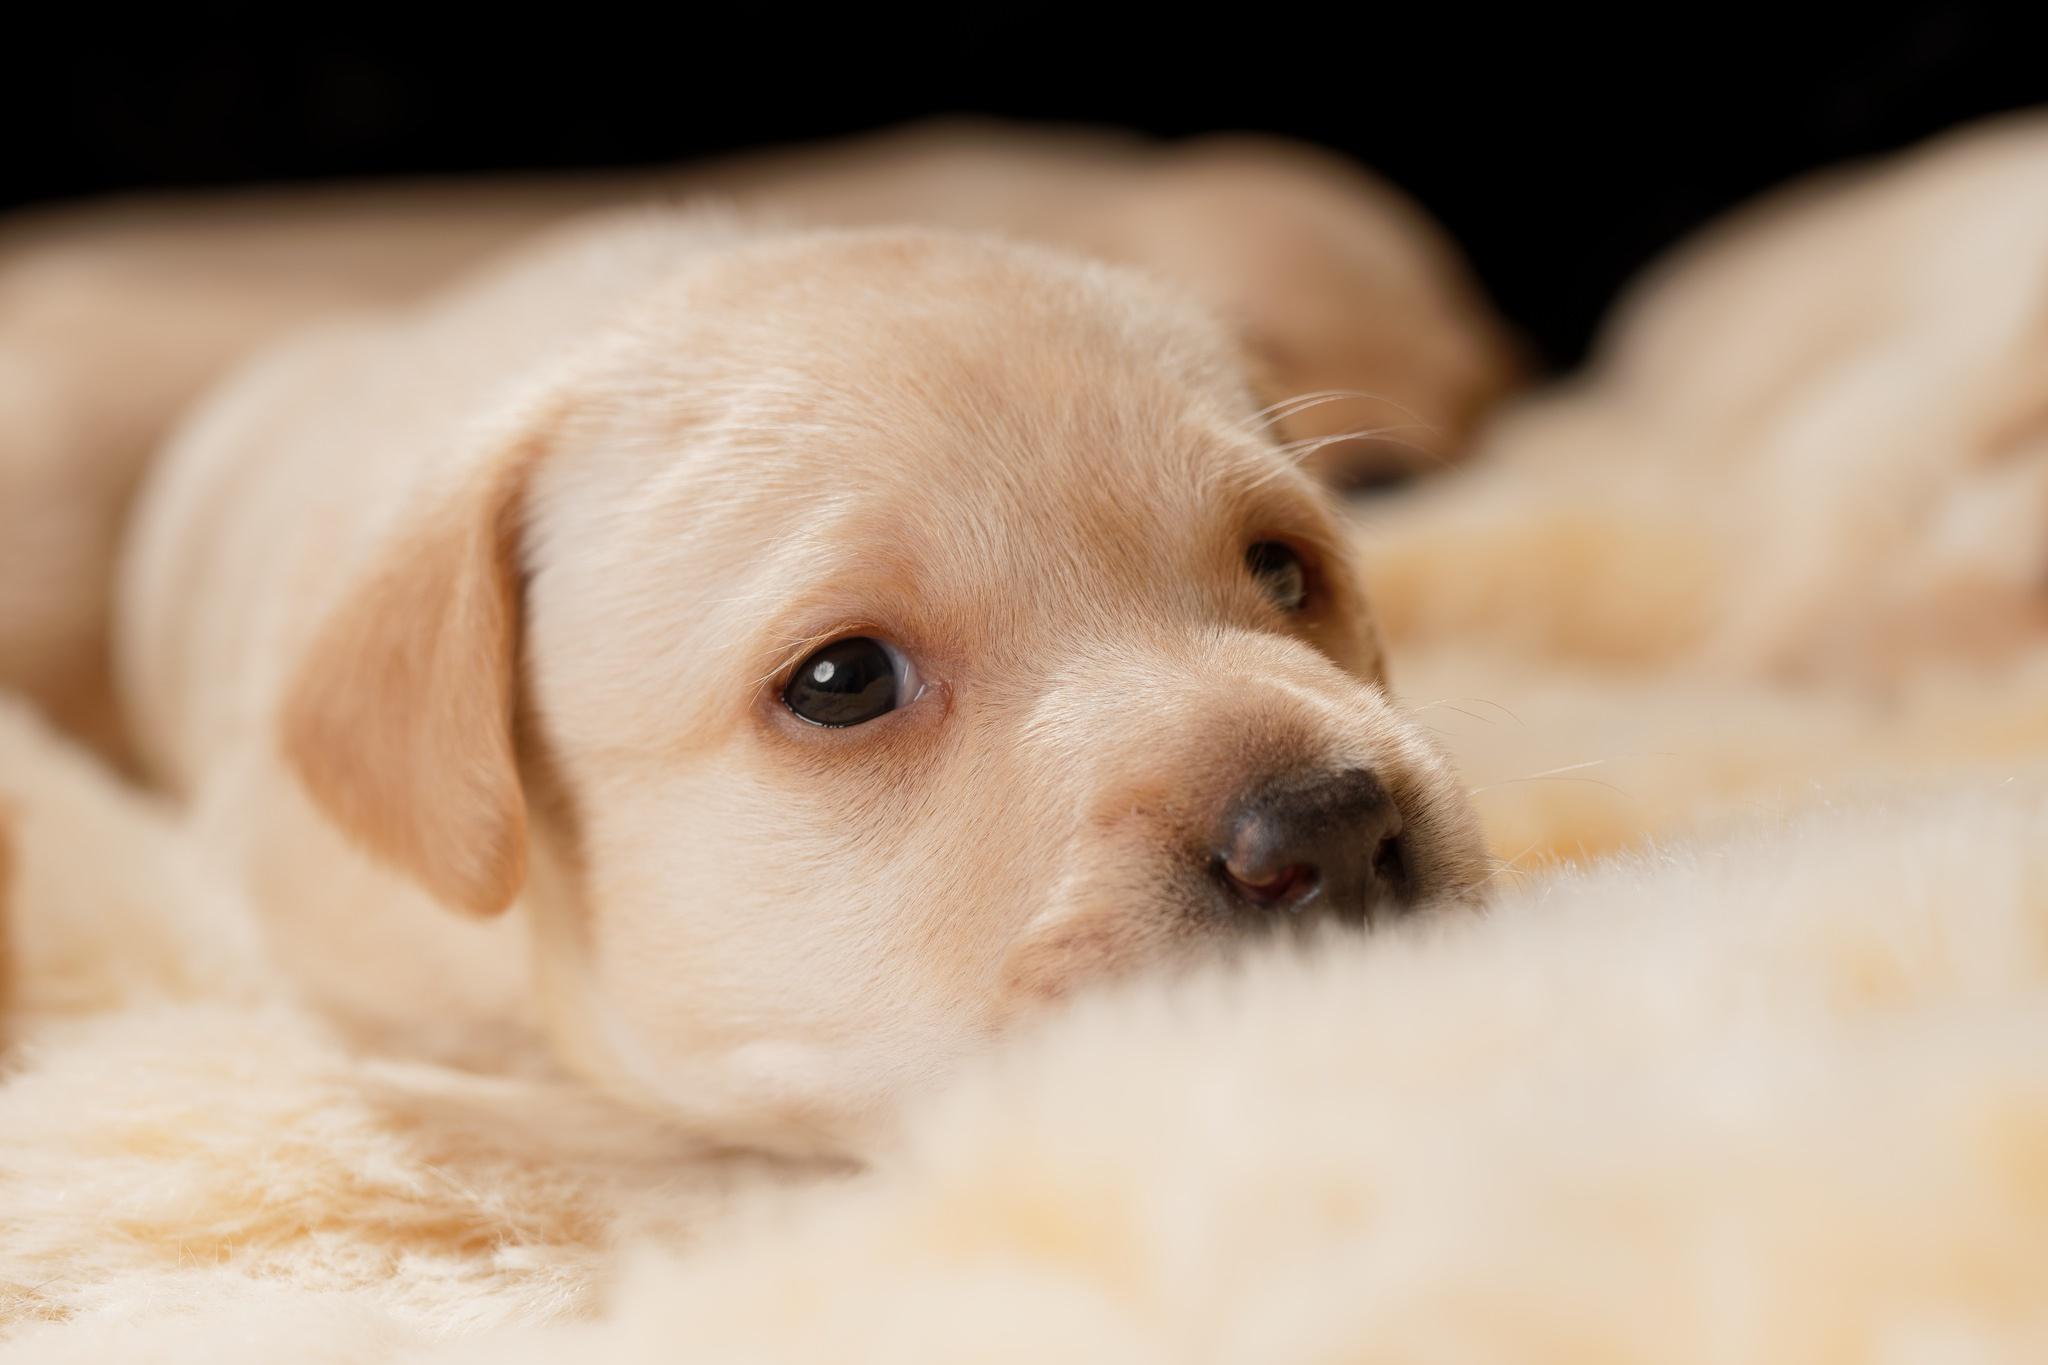 Картинки лежащего щенка